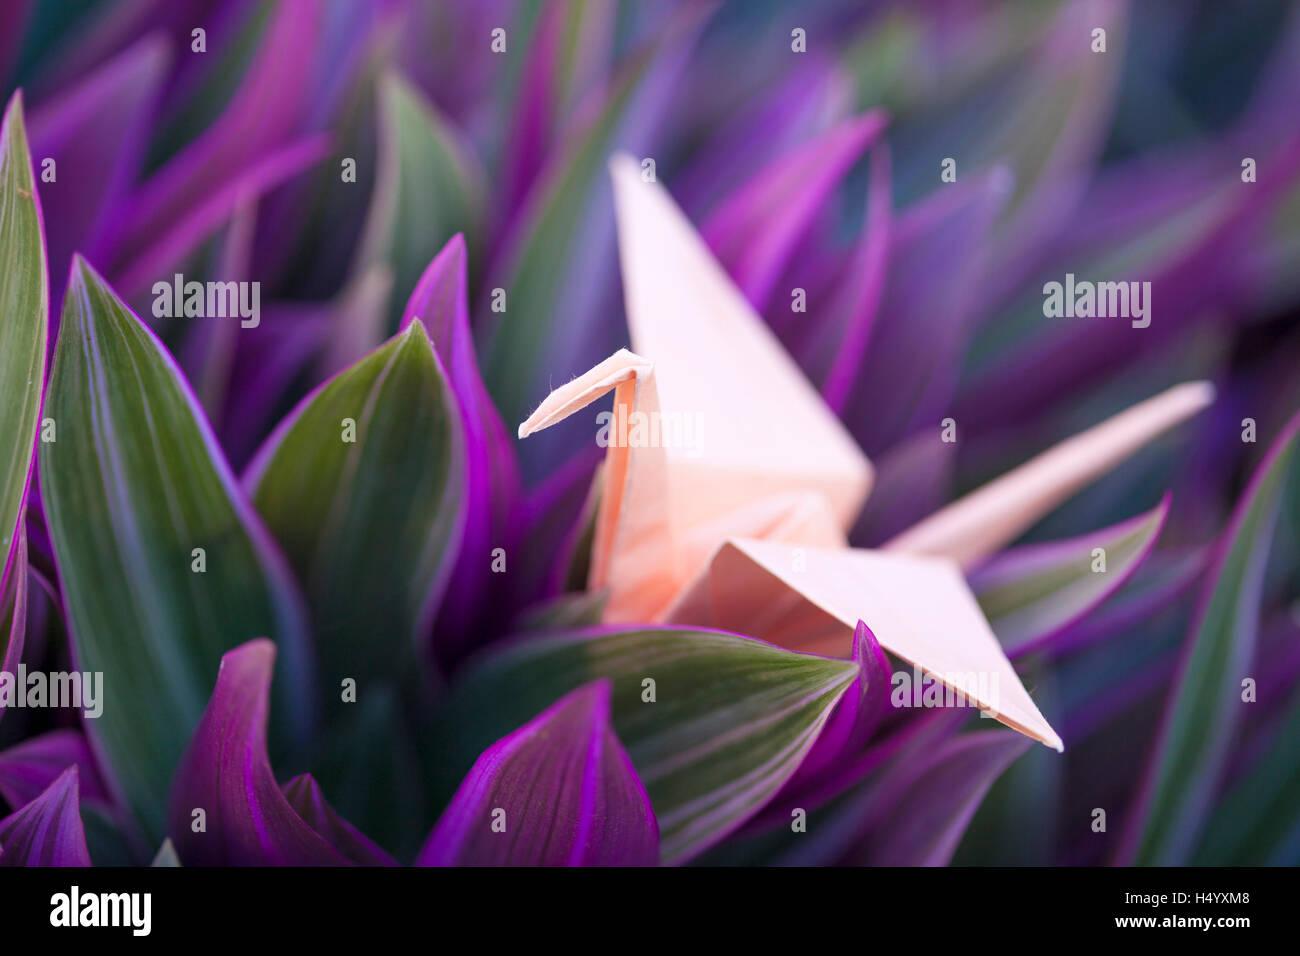 Origami Papier Kran im bunten Laub von Tradescantia spathacea Stockbild